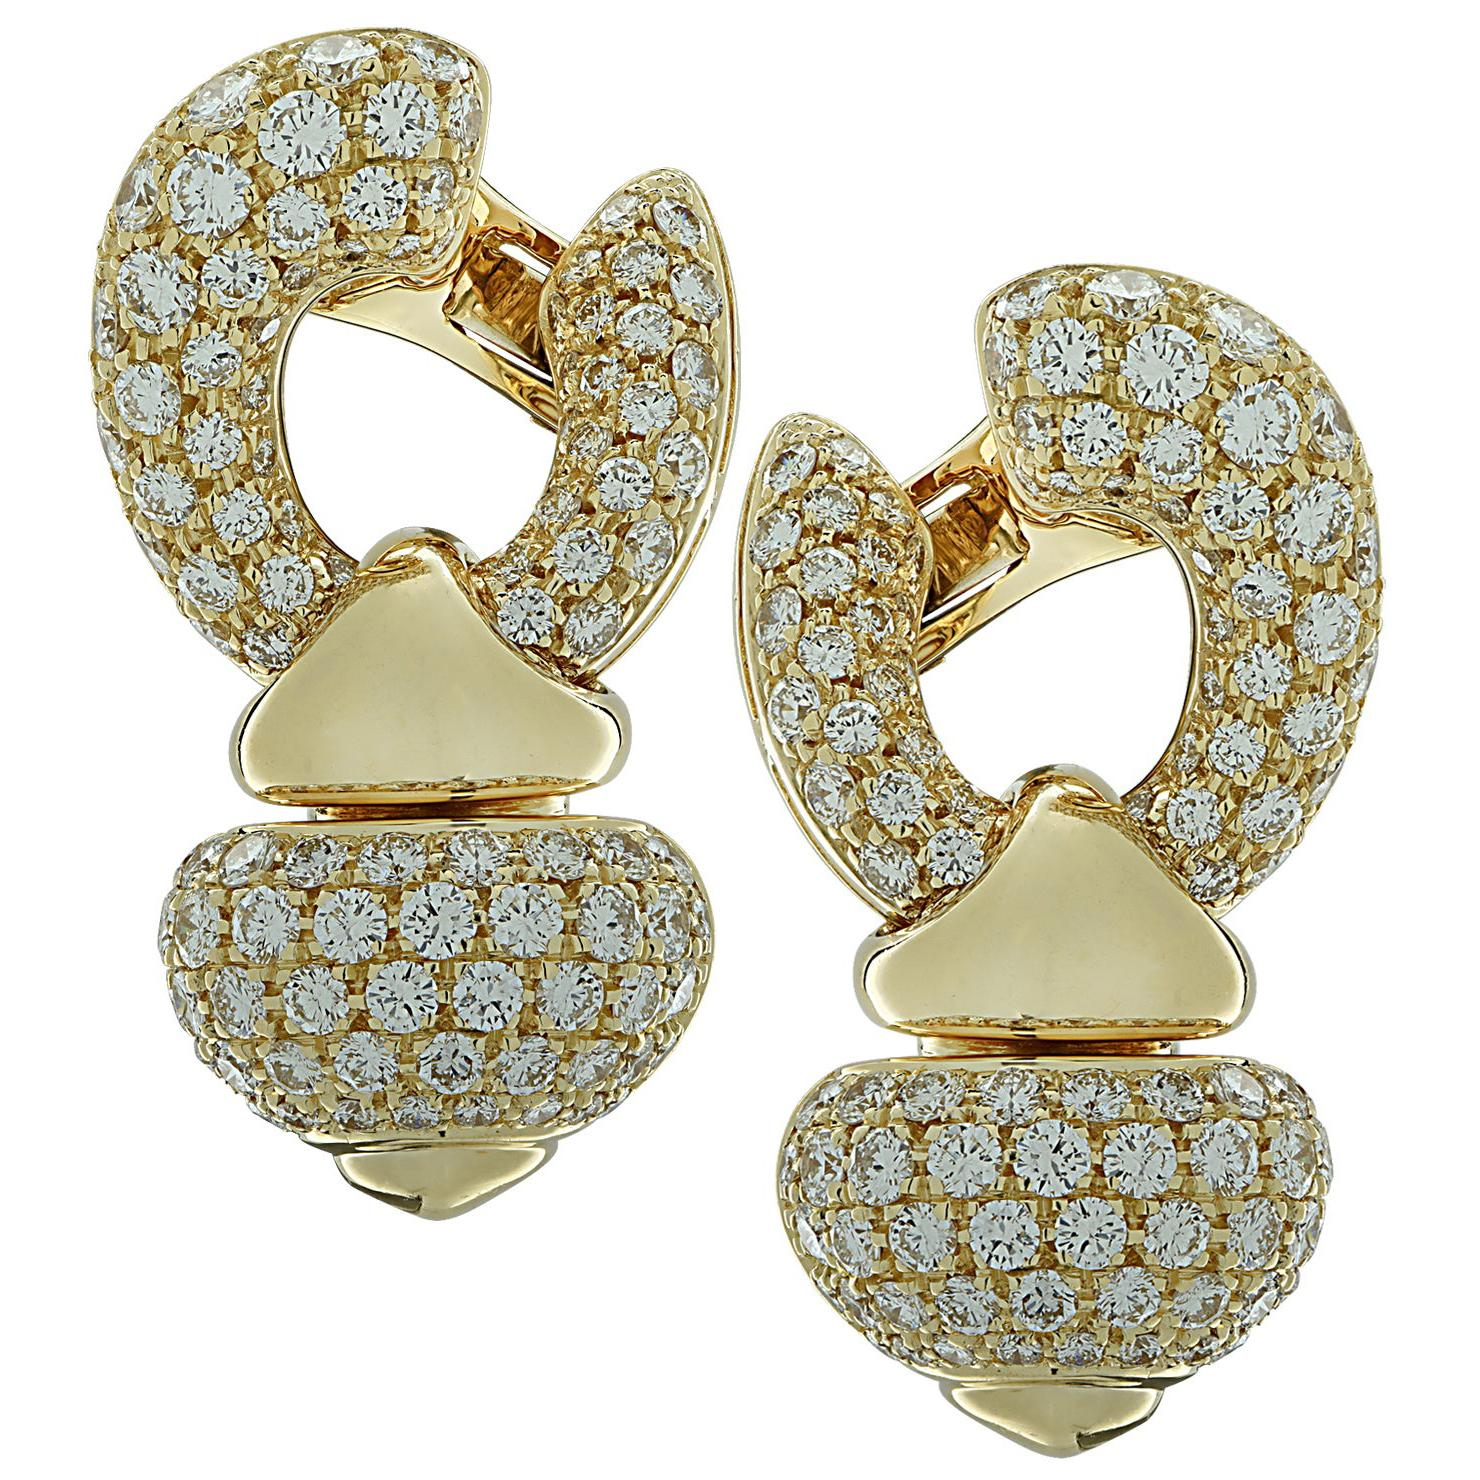 Bvlgari Diamond Pigne Ear Clips